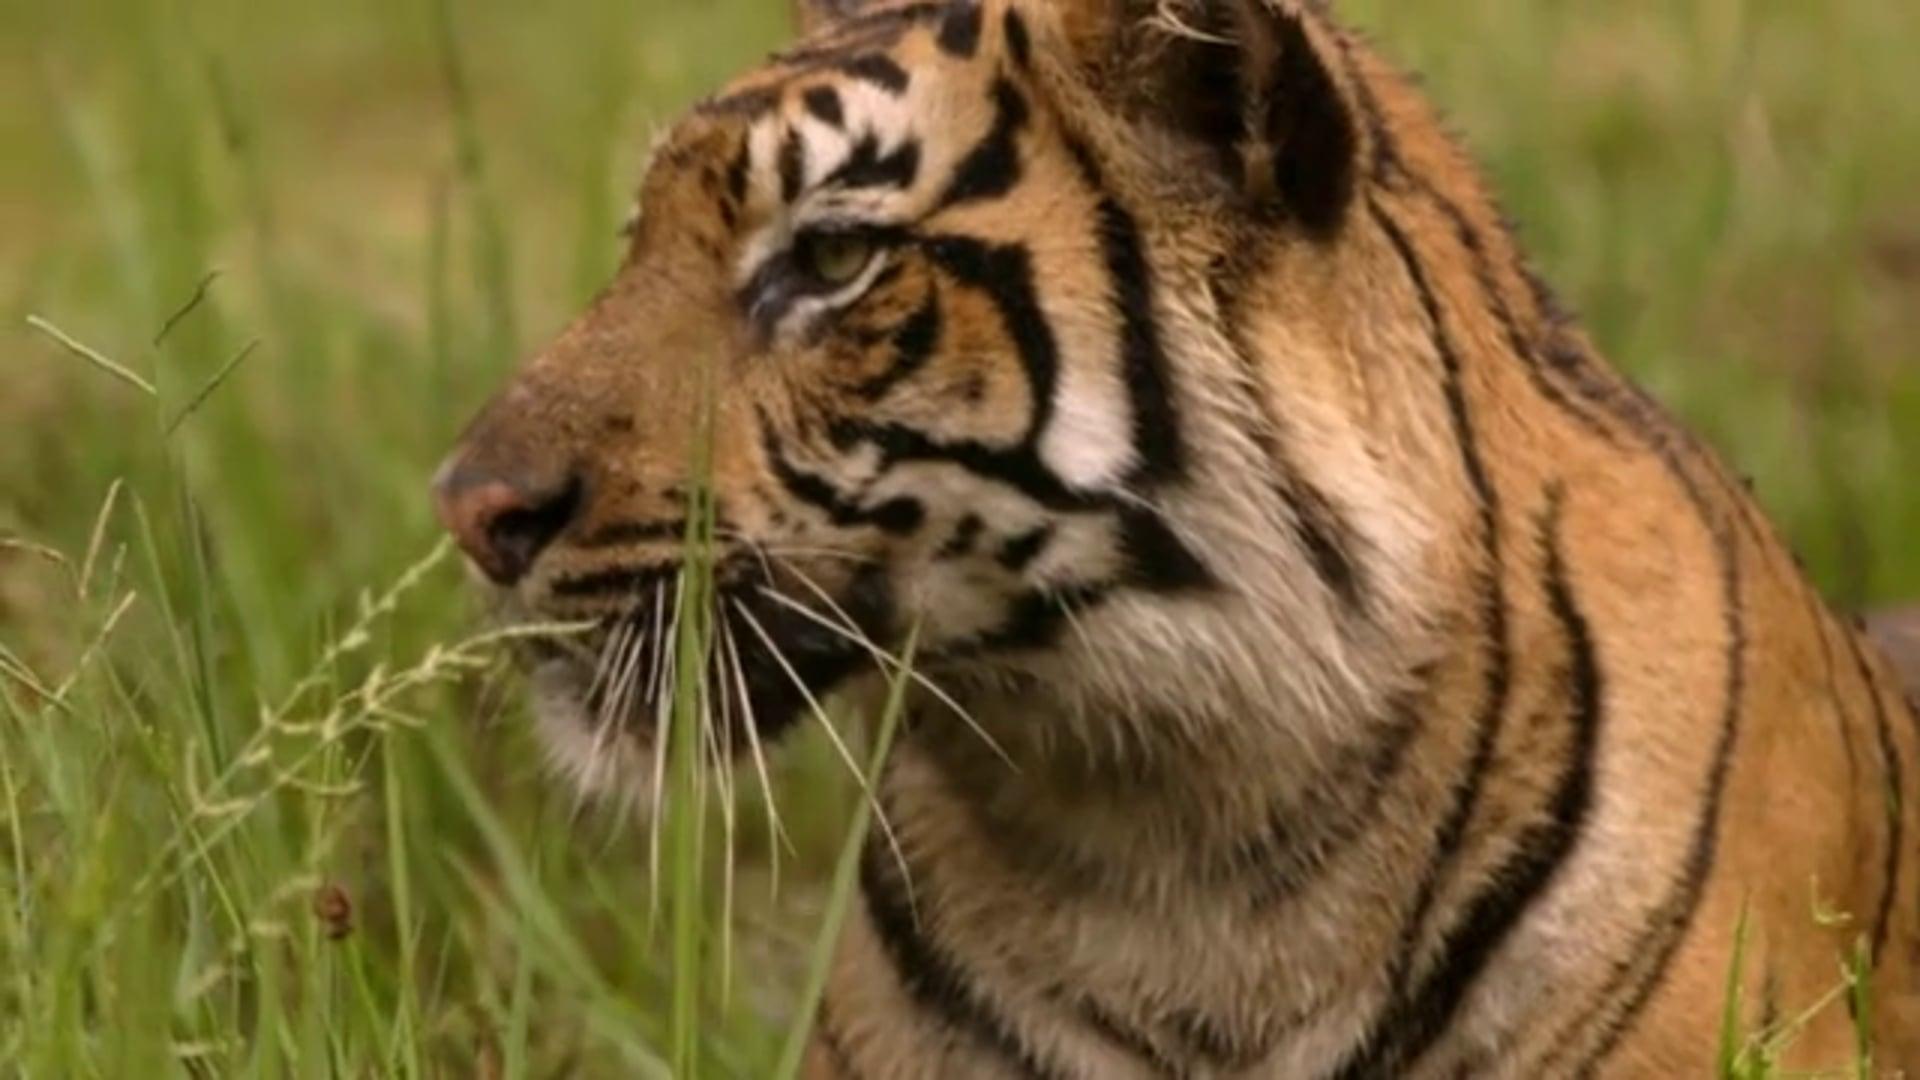 Tambling Wildlife Nature Conservation